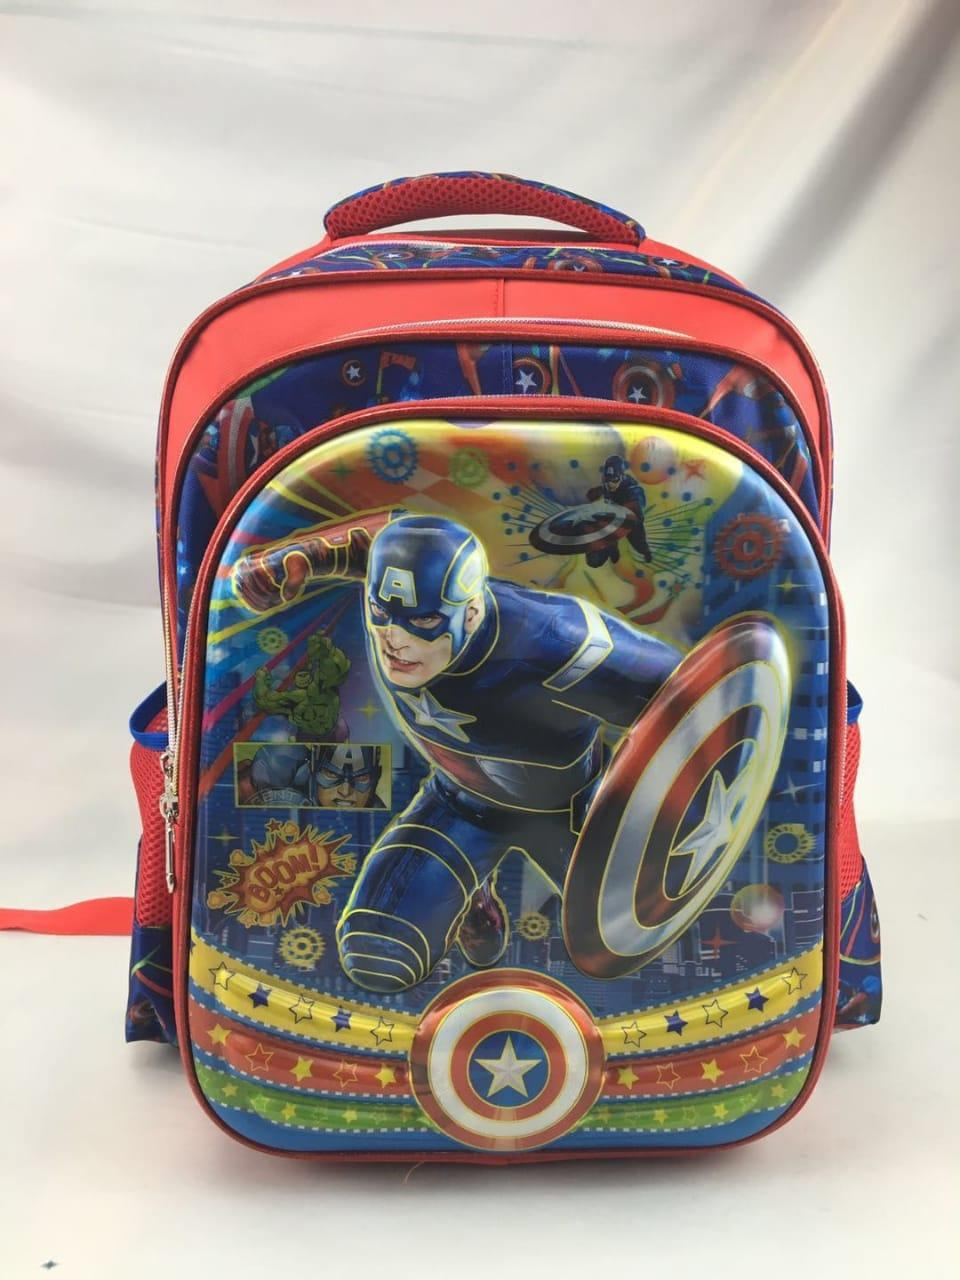 Onlan Tas Ransel Anak SD Karakter Anak Laki Laki Avengers Captain Amerika 5D Timbul Import - Blue